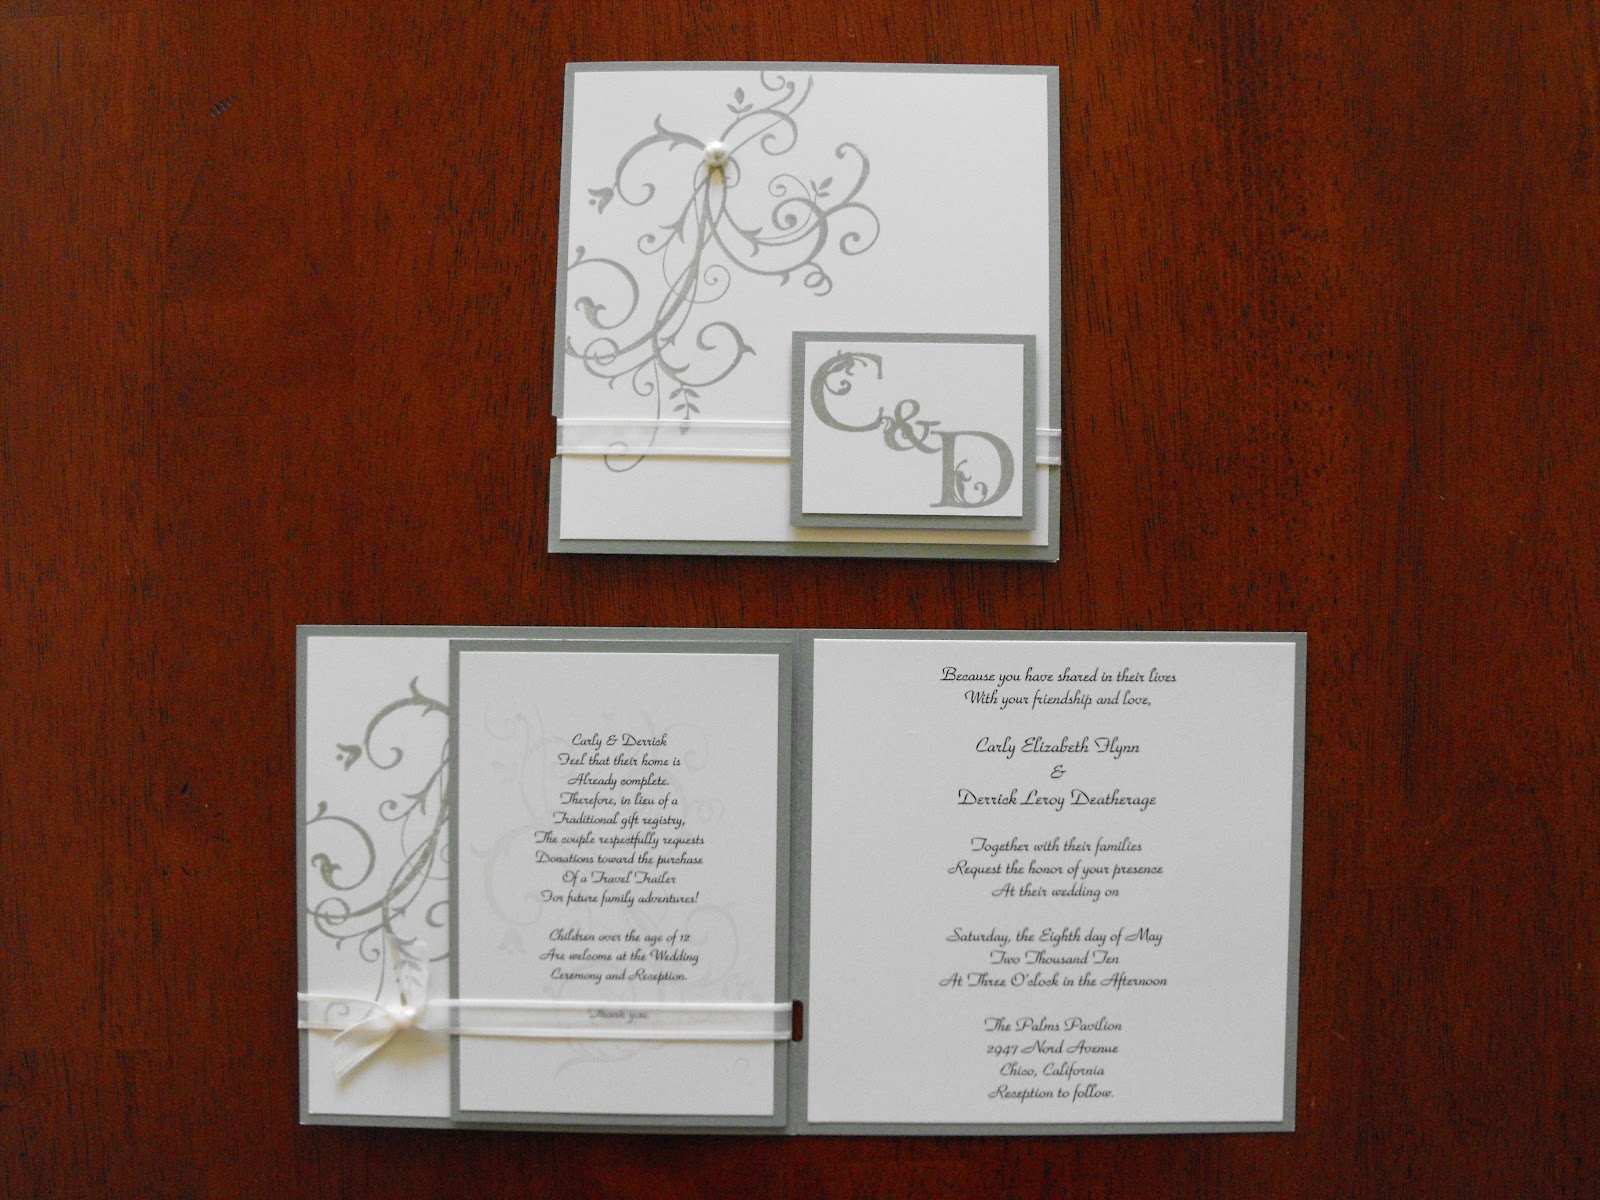 Proper Way To Stuff Wedding Invitations: Handmade Wedding Invitations : Have Your Dream Wedding